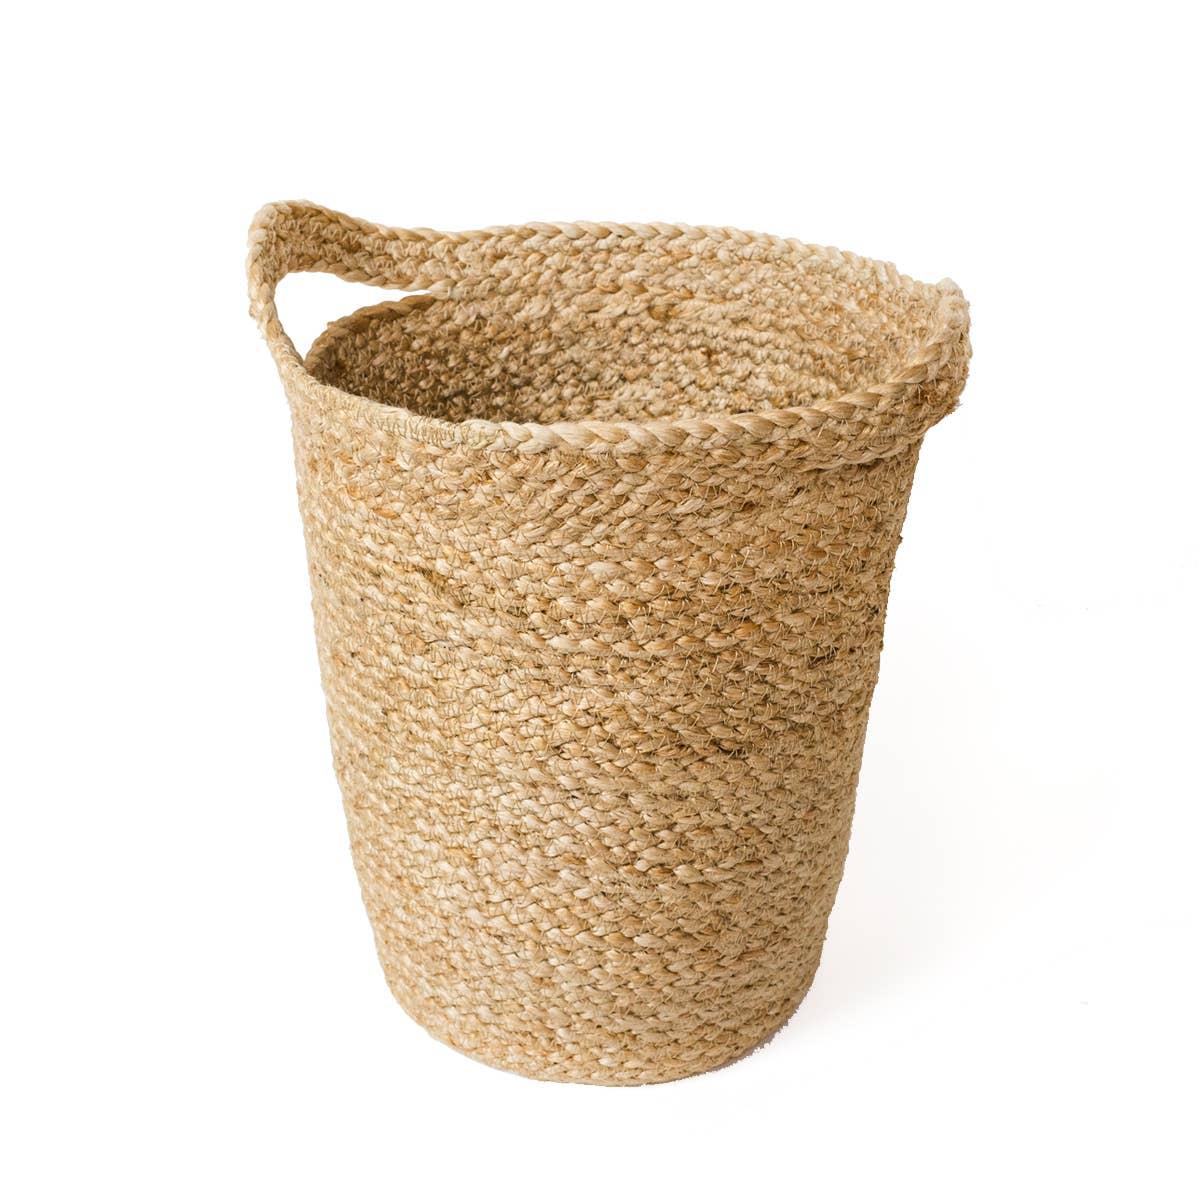 Kata Basket with Slit Handle (Set of 3) | Trada Marketplace